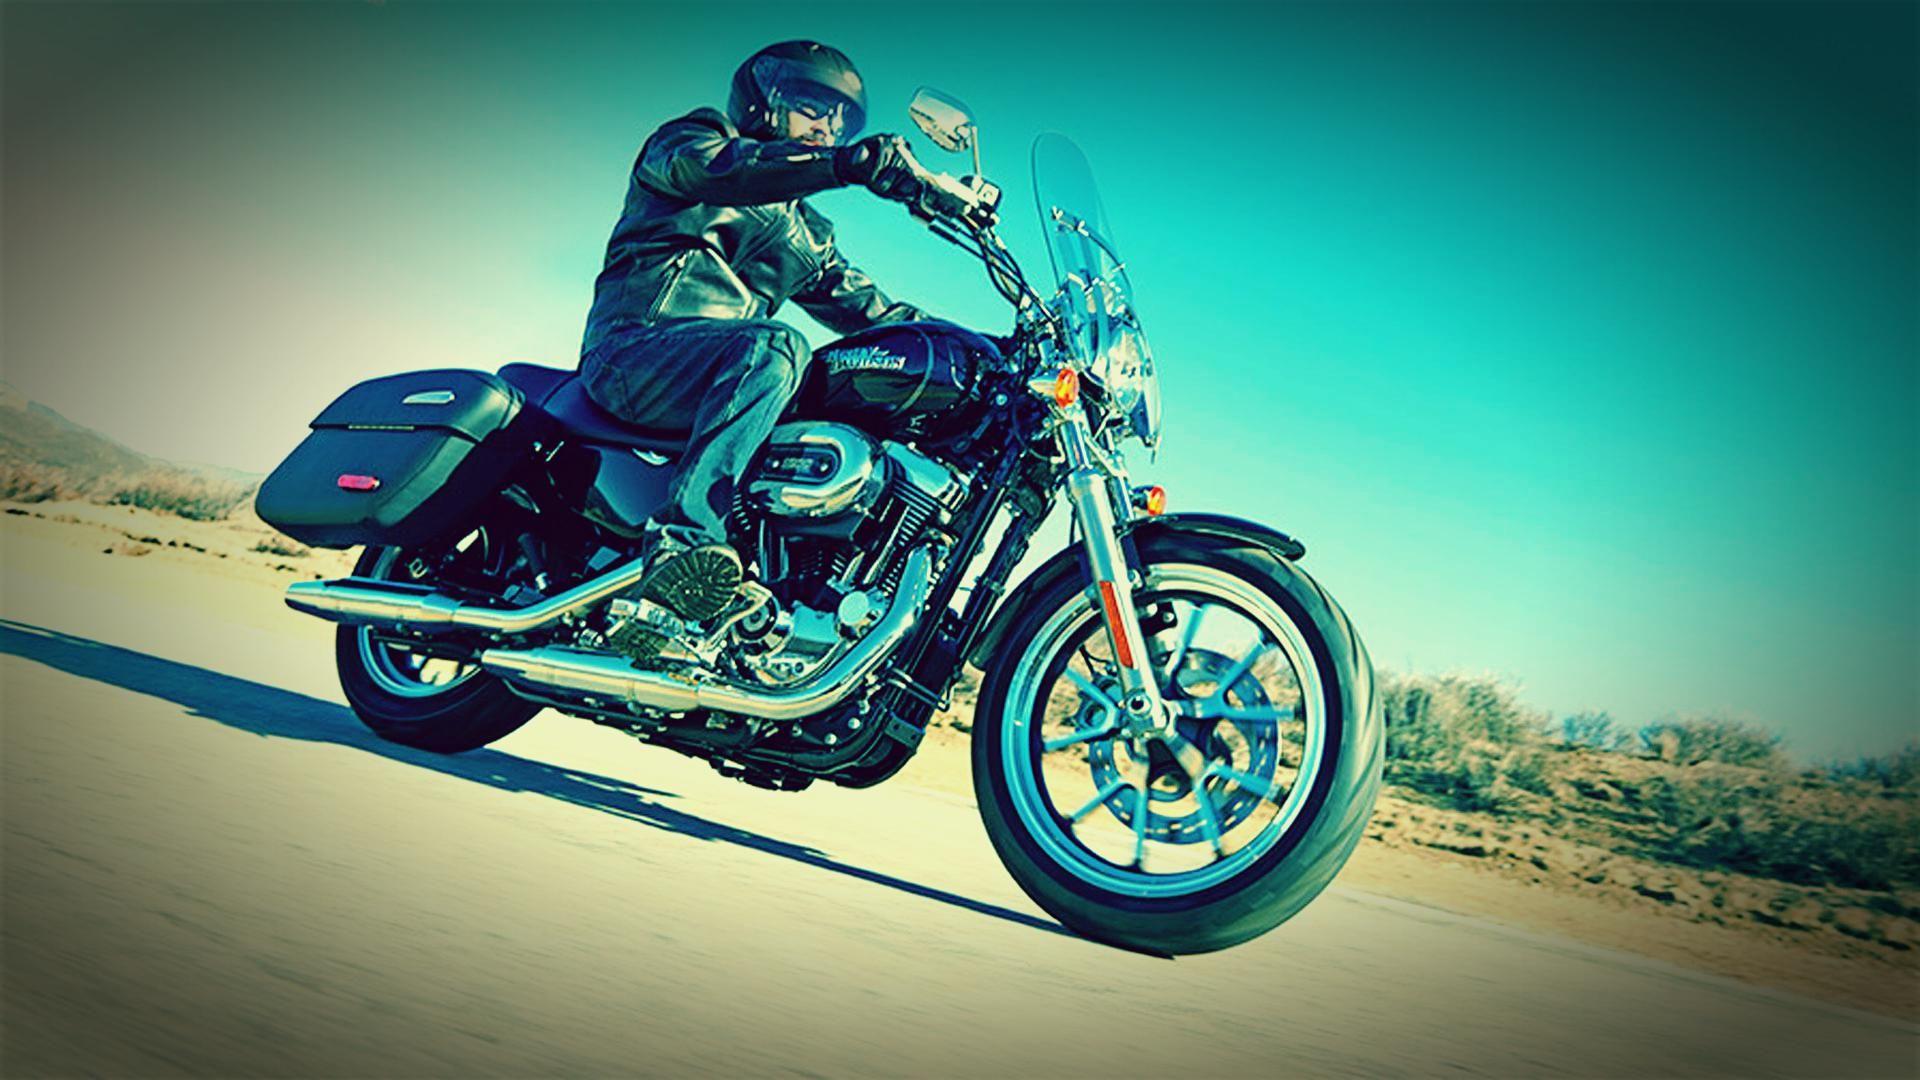 wallpapers Harley Davidson SuperLow 1200T 2014 2014 Harley